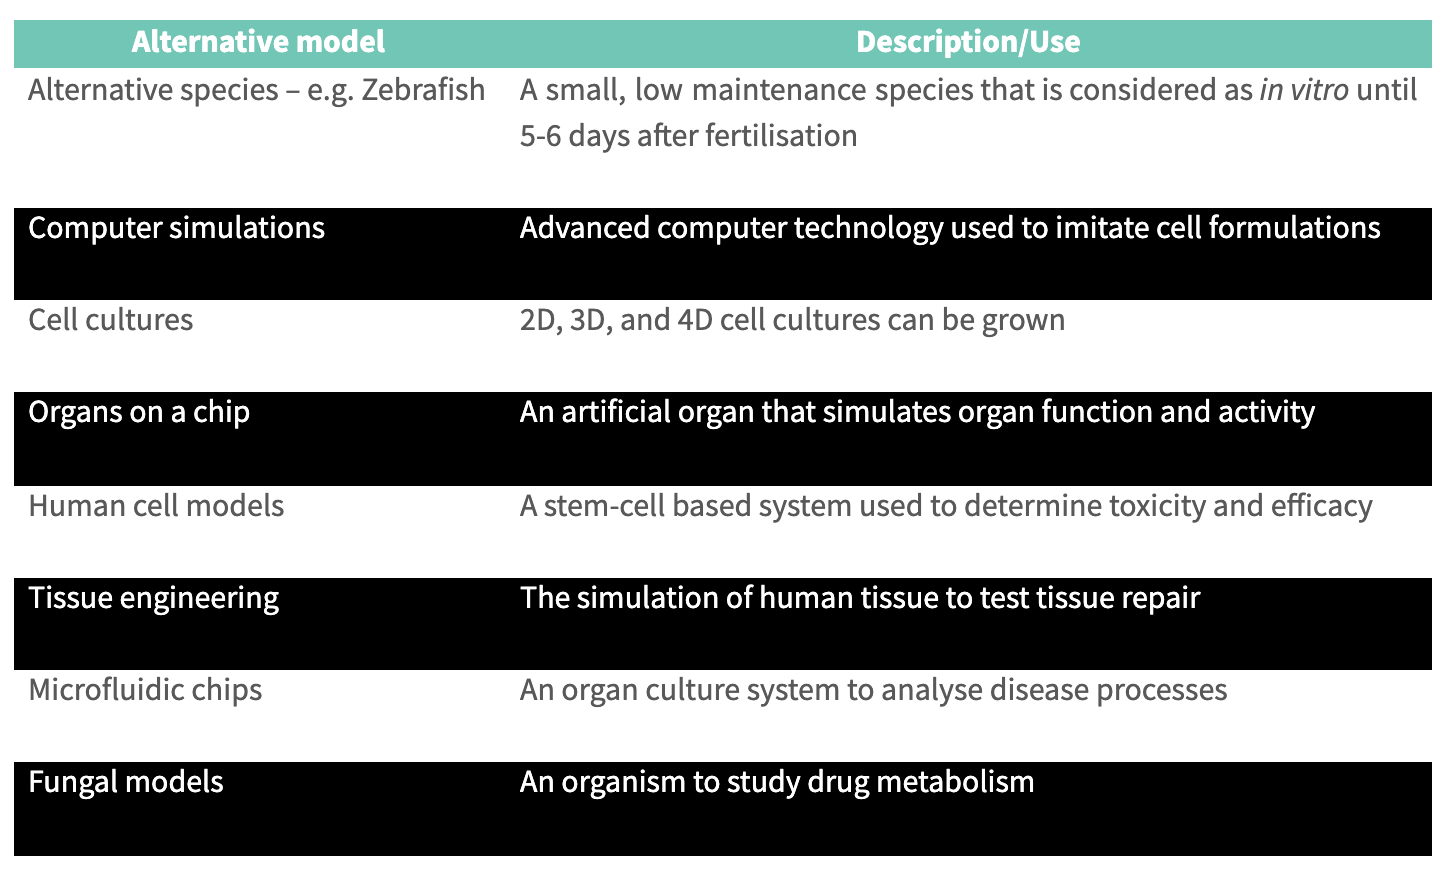 The Cost of Drug Development Using Alternative Models